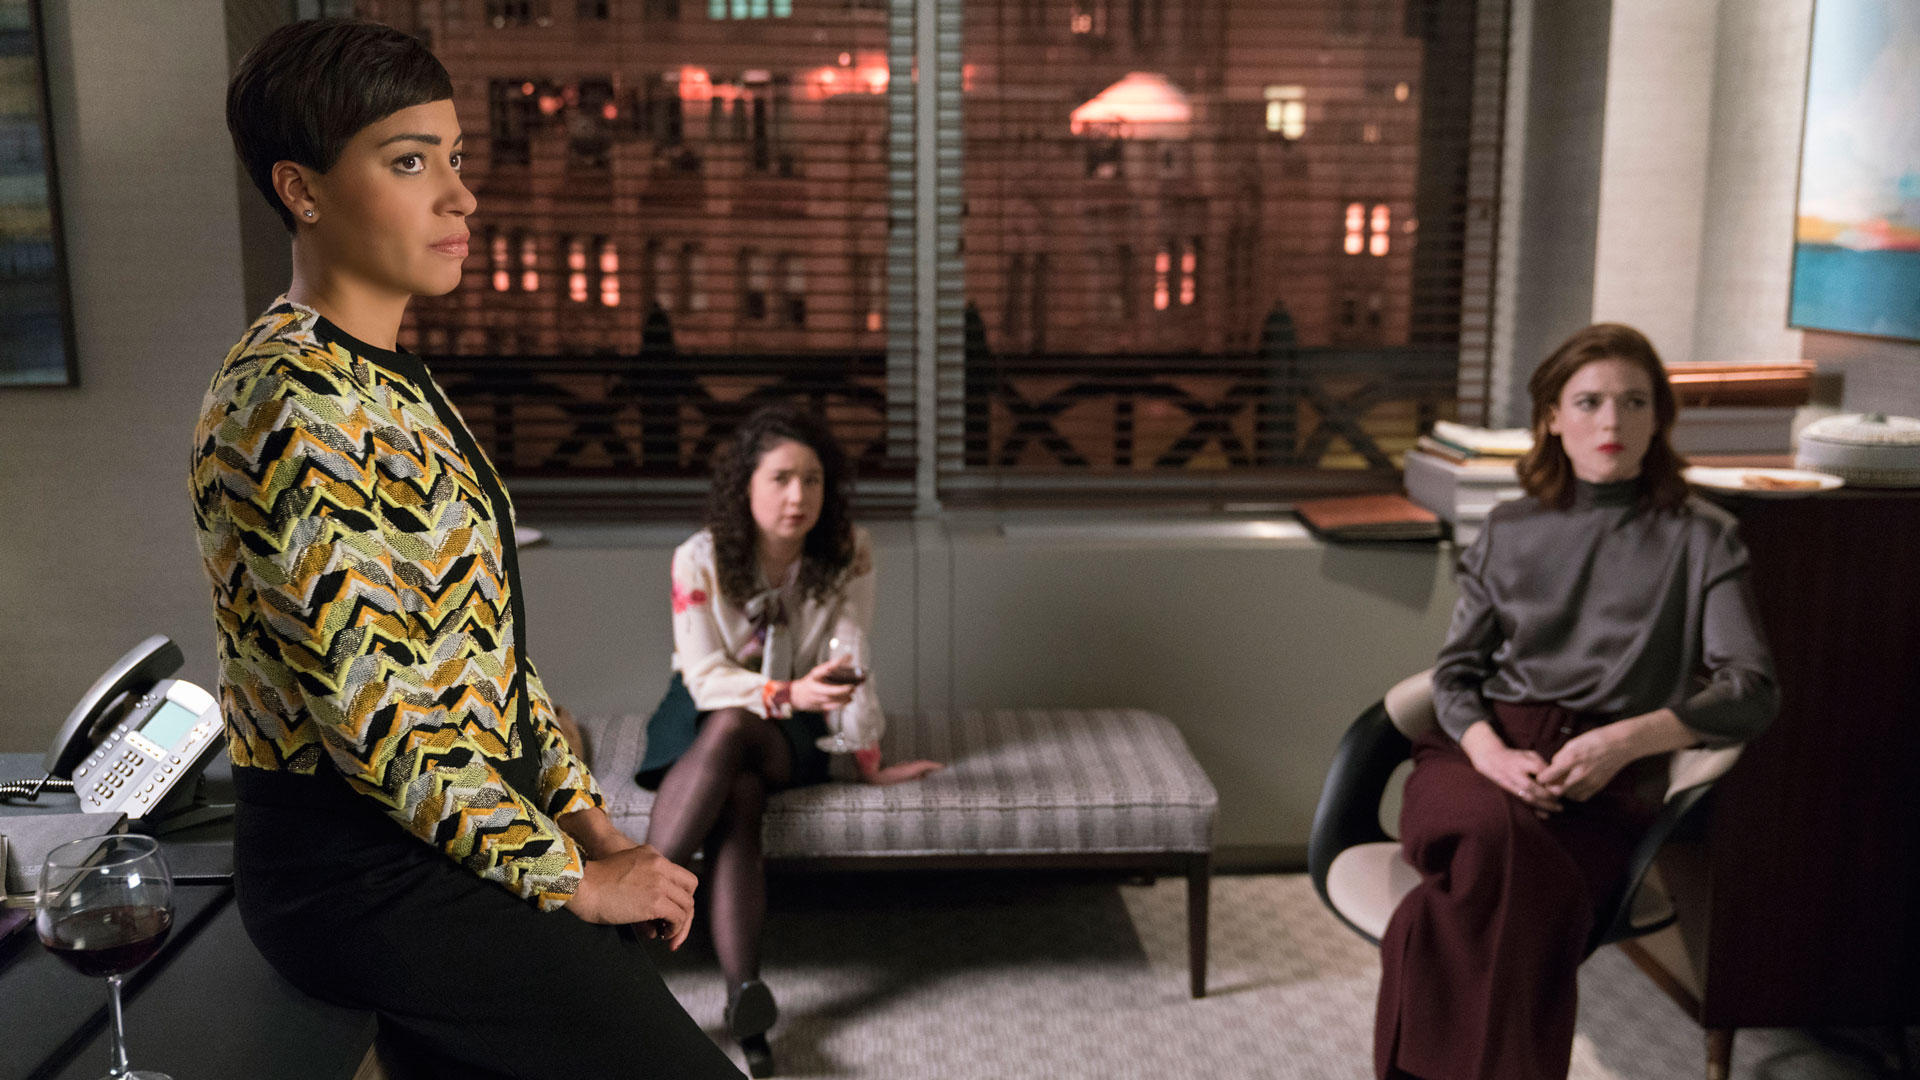 Lucca Quinn (Cush Jumbo), Marissa Gold (Sarah Steele), and Maia Rindell (Rose Leslie)